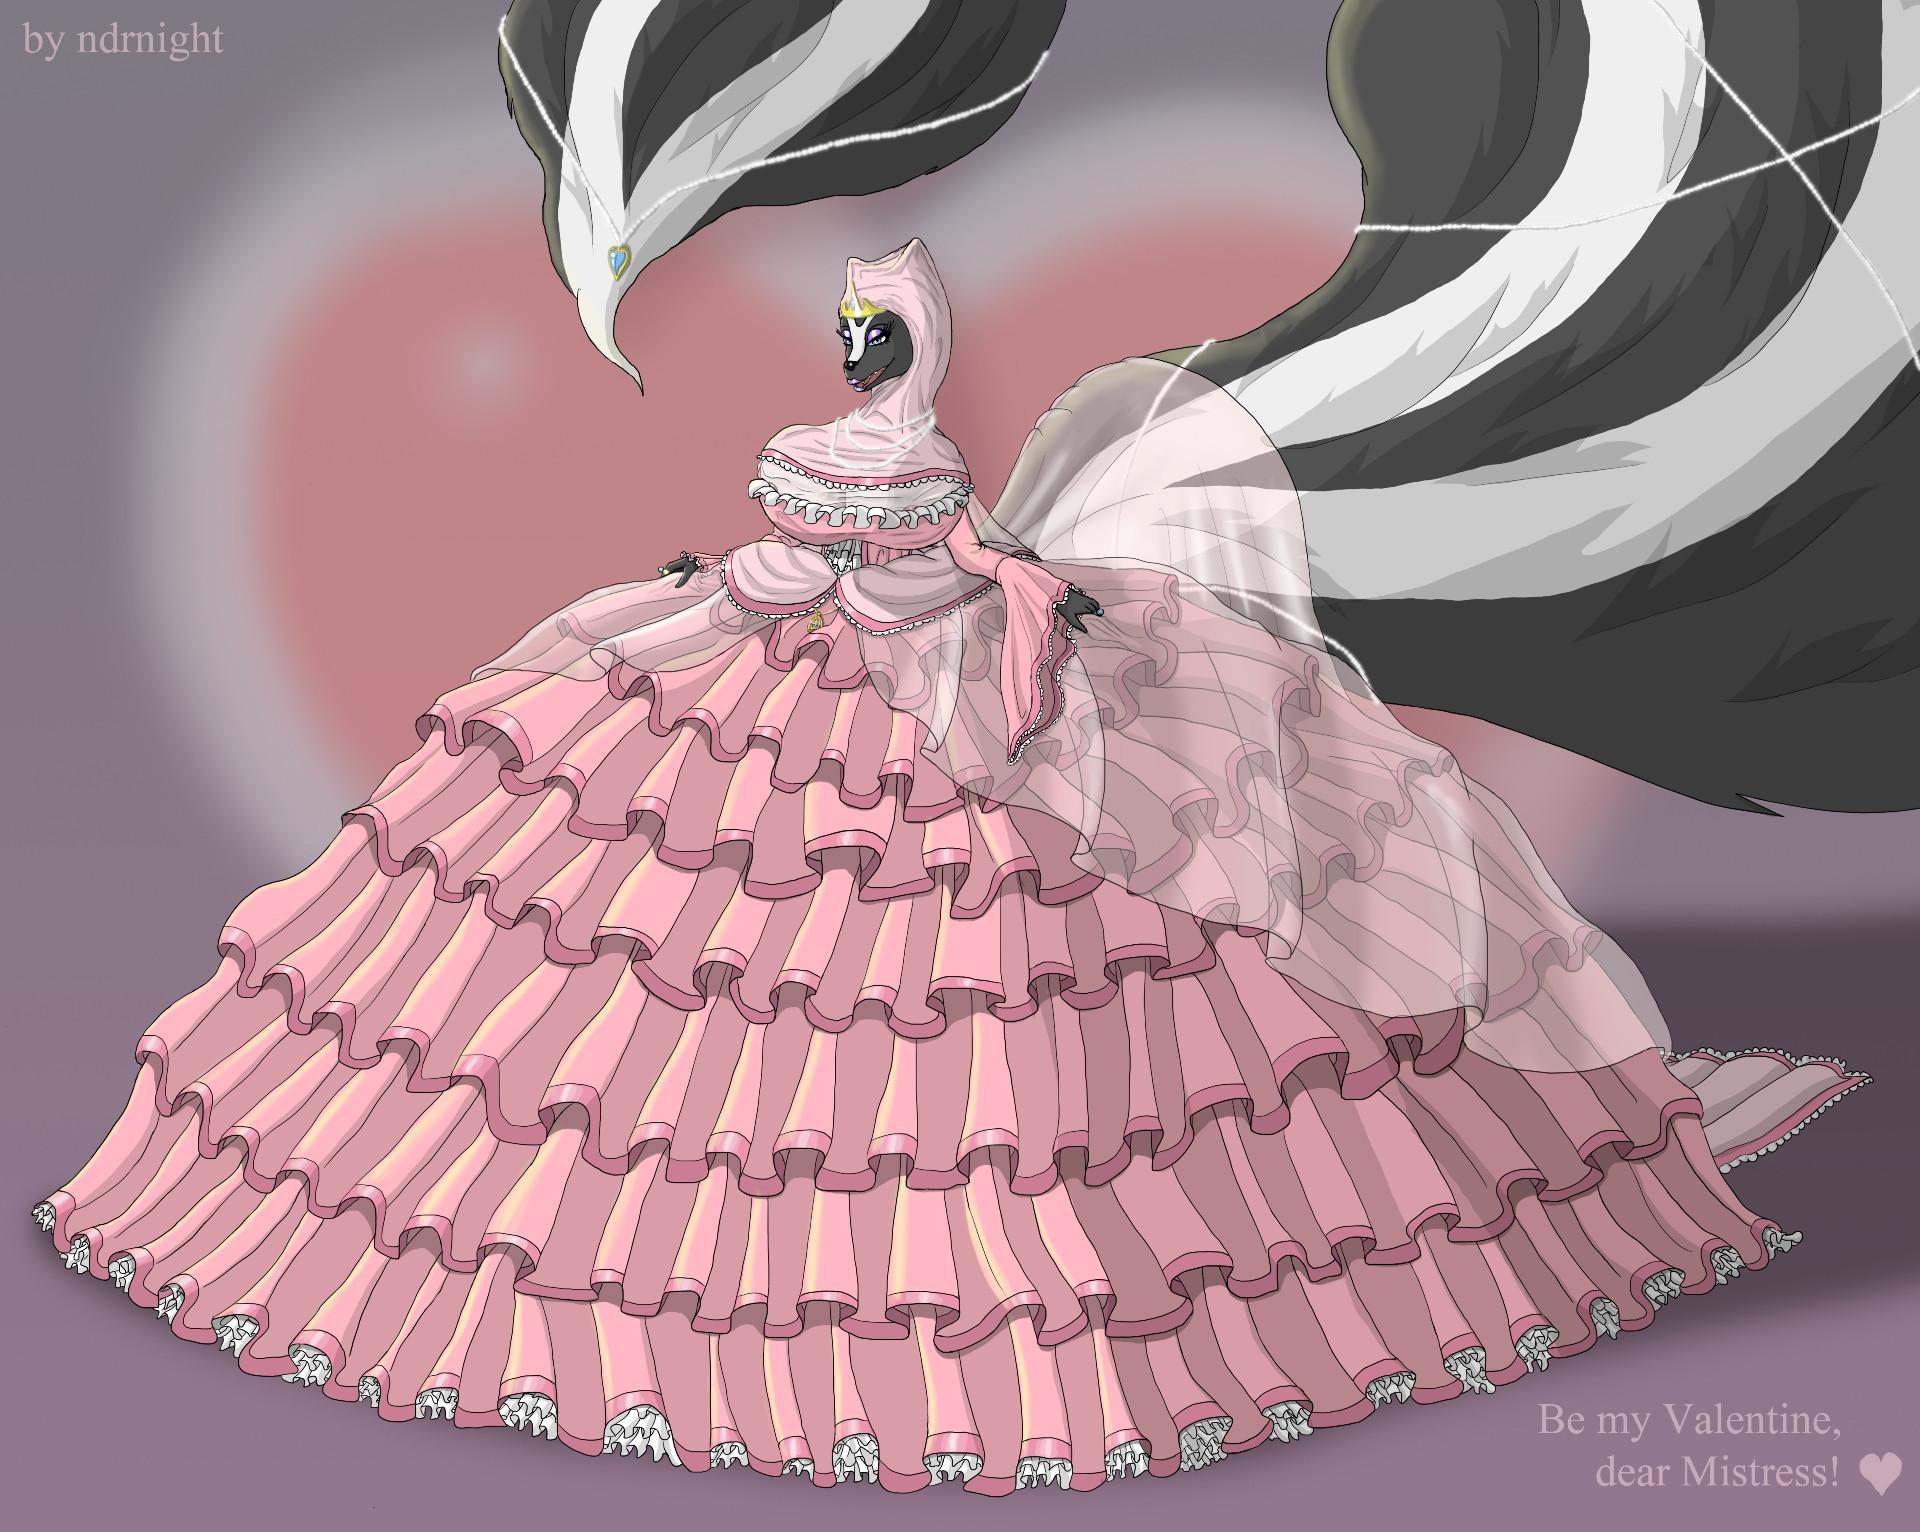 Be my Valentine, Mistress. by ASKABANIUM